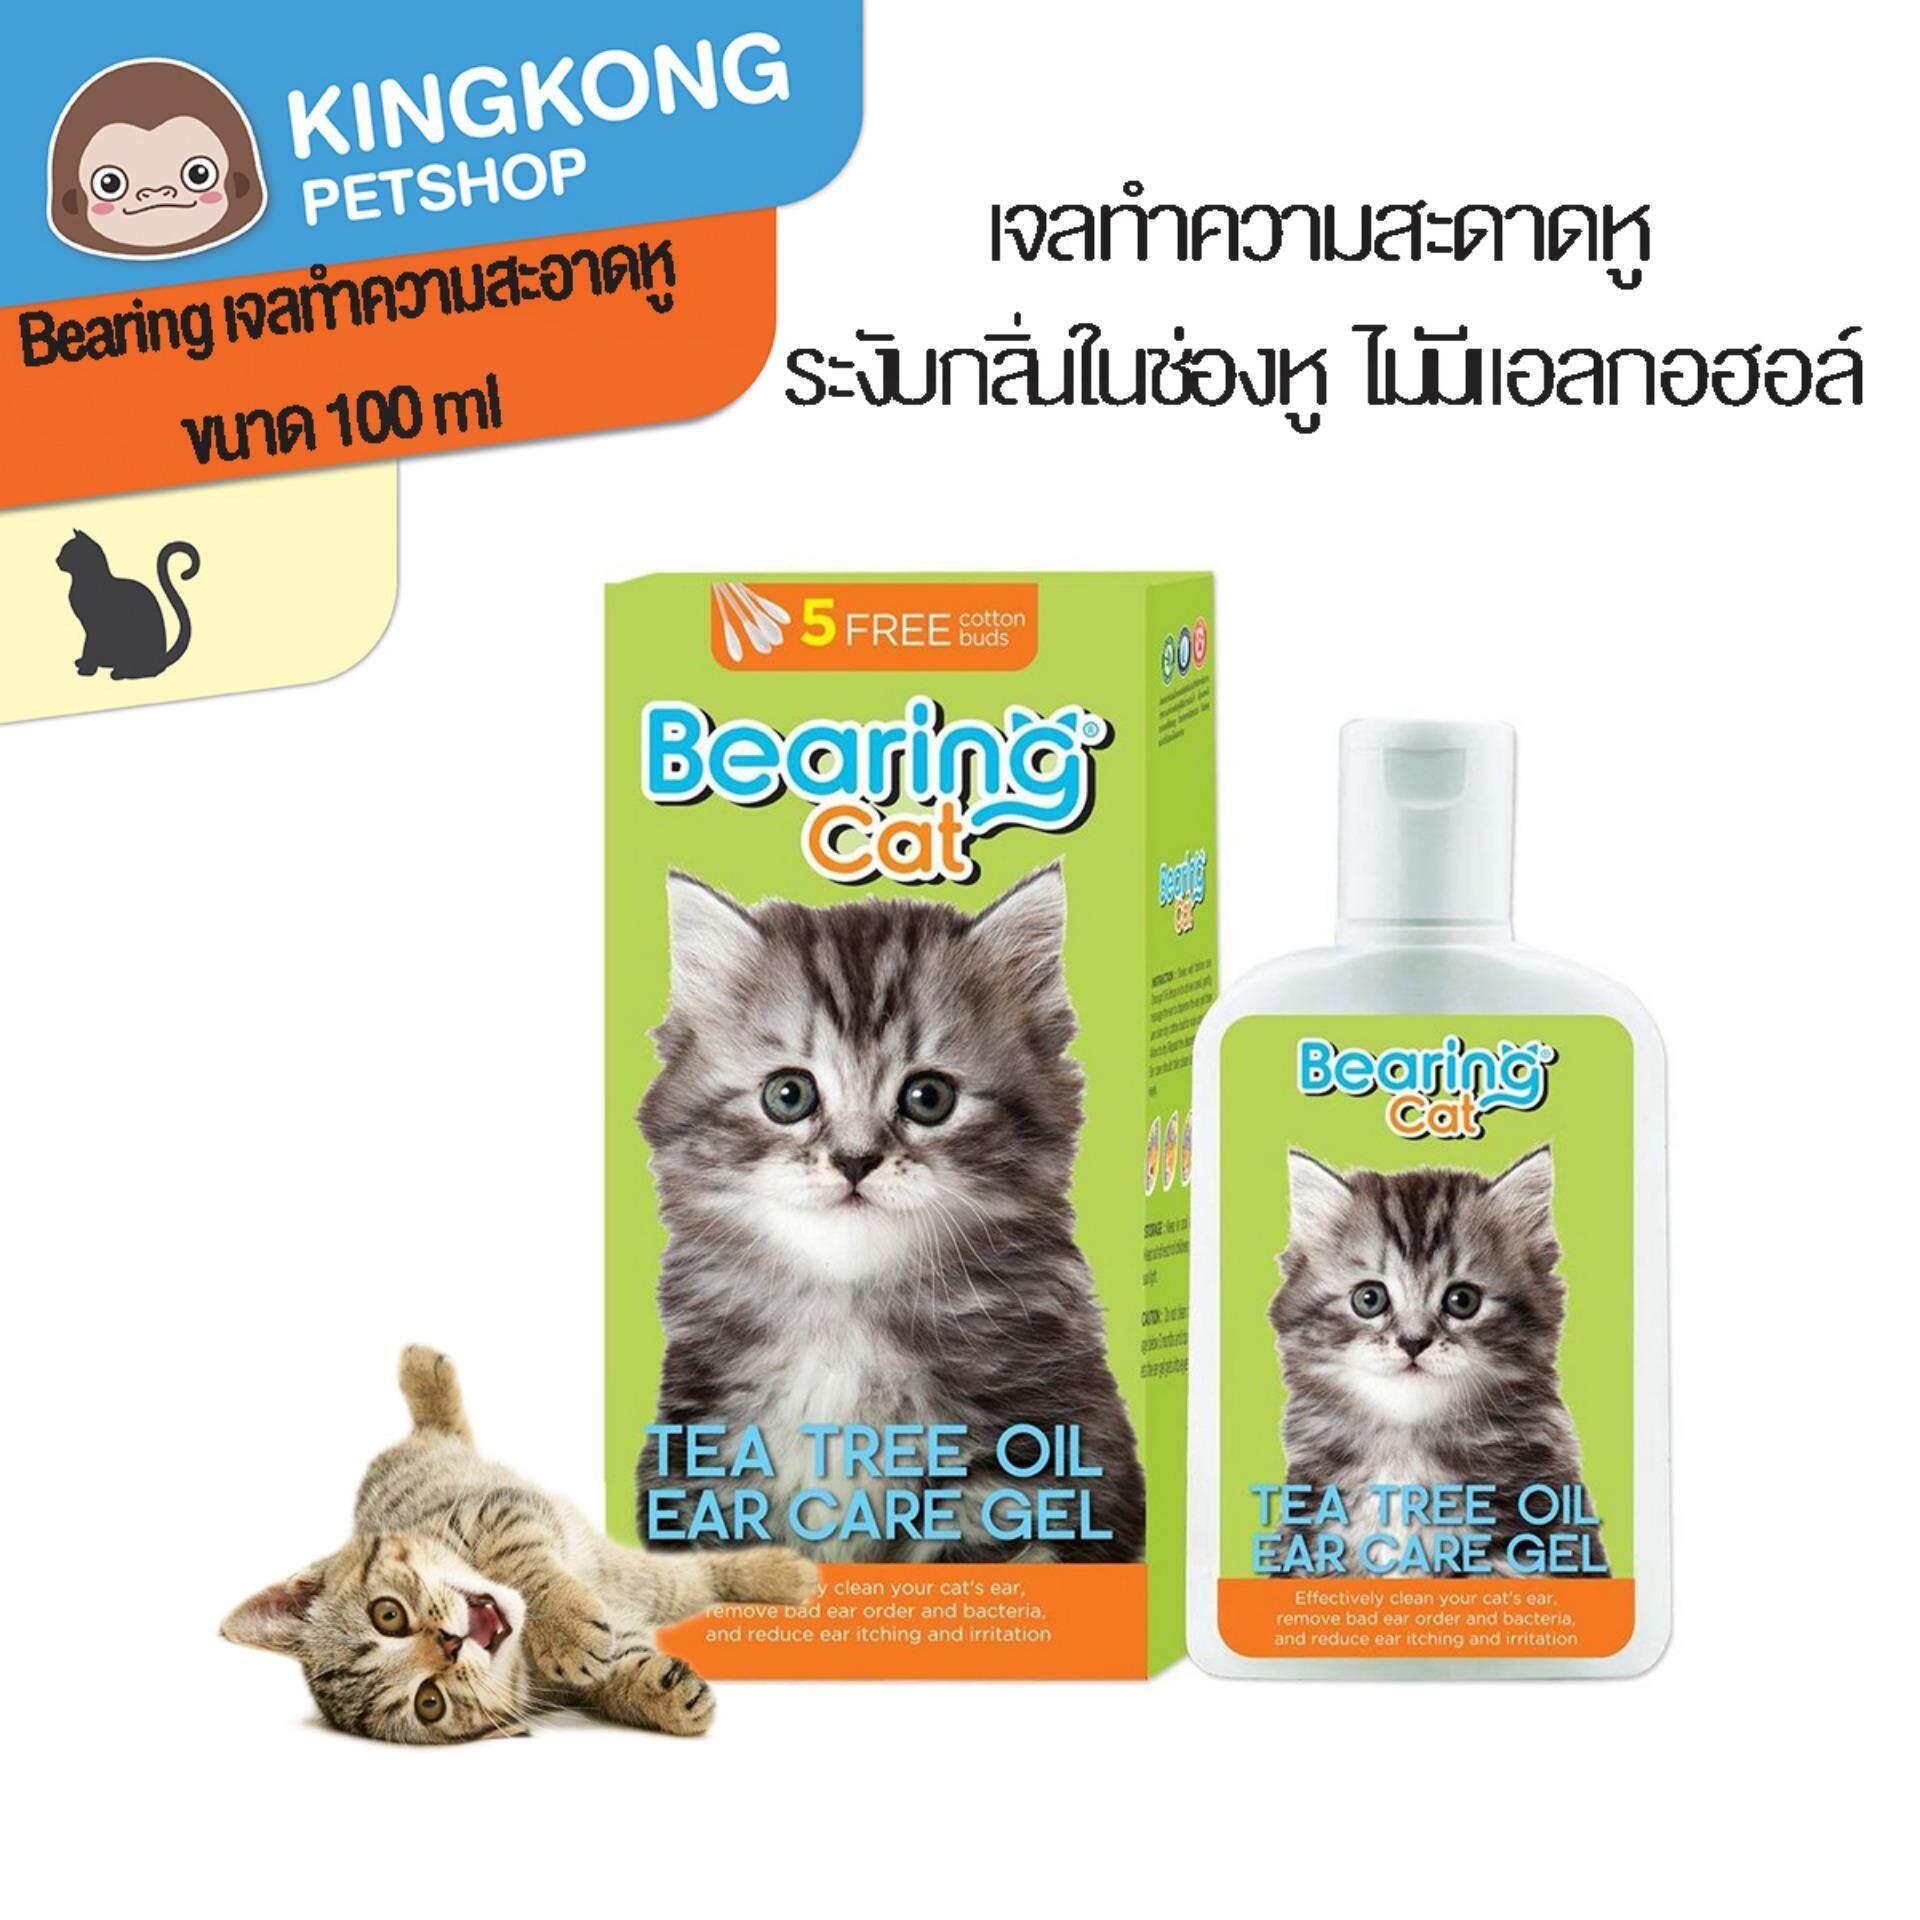 Bearing เจลทำความสะอาดหู ที ทรี ออยส์ สำหรับแมว ขนาด 100 ml.